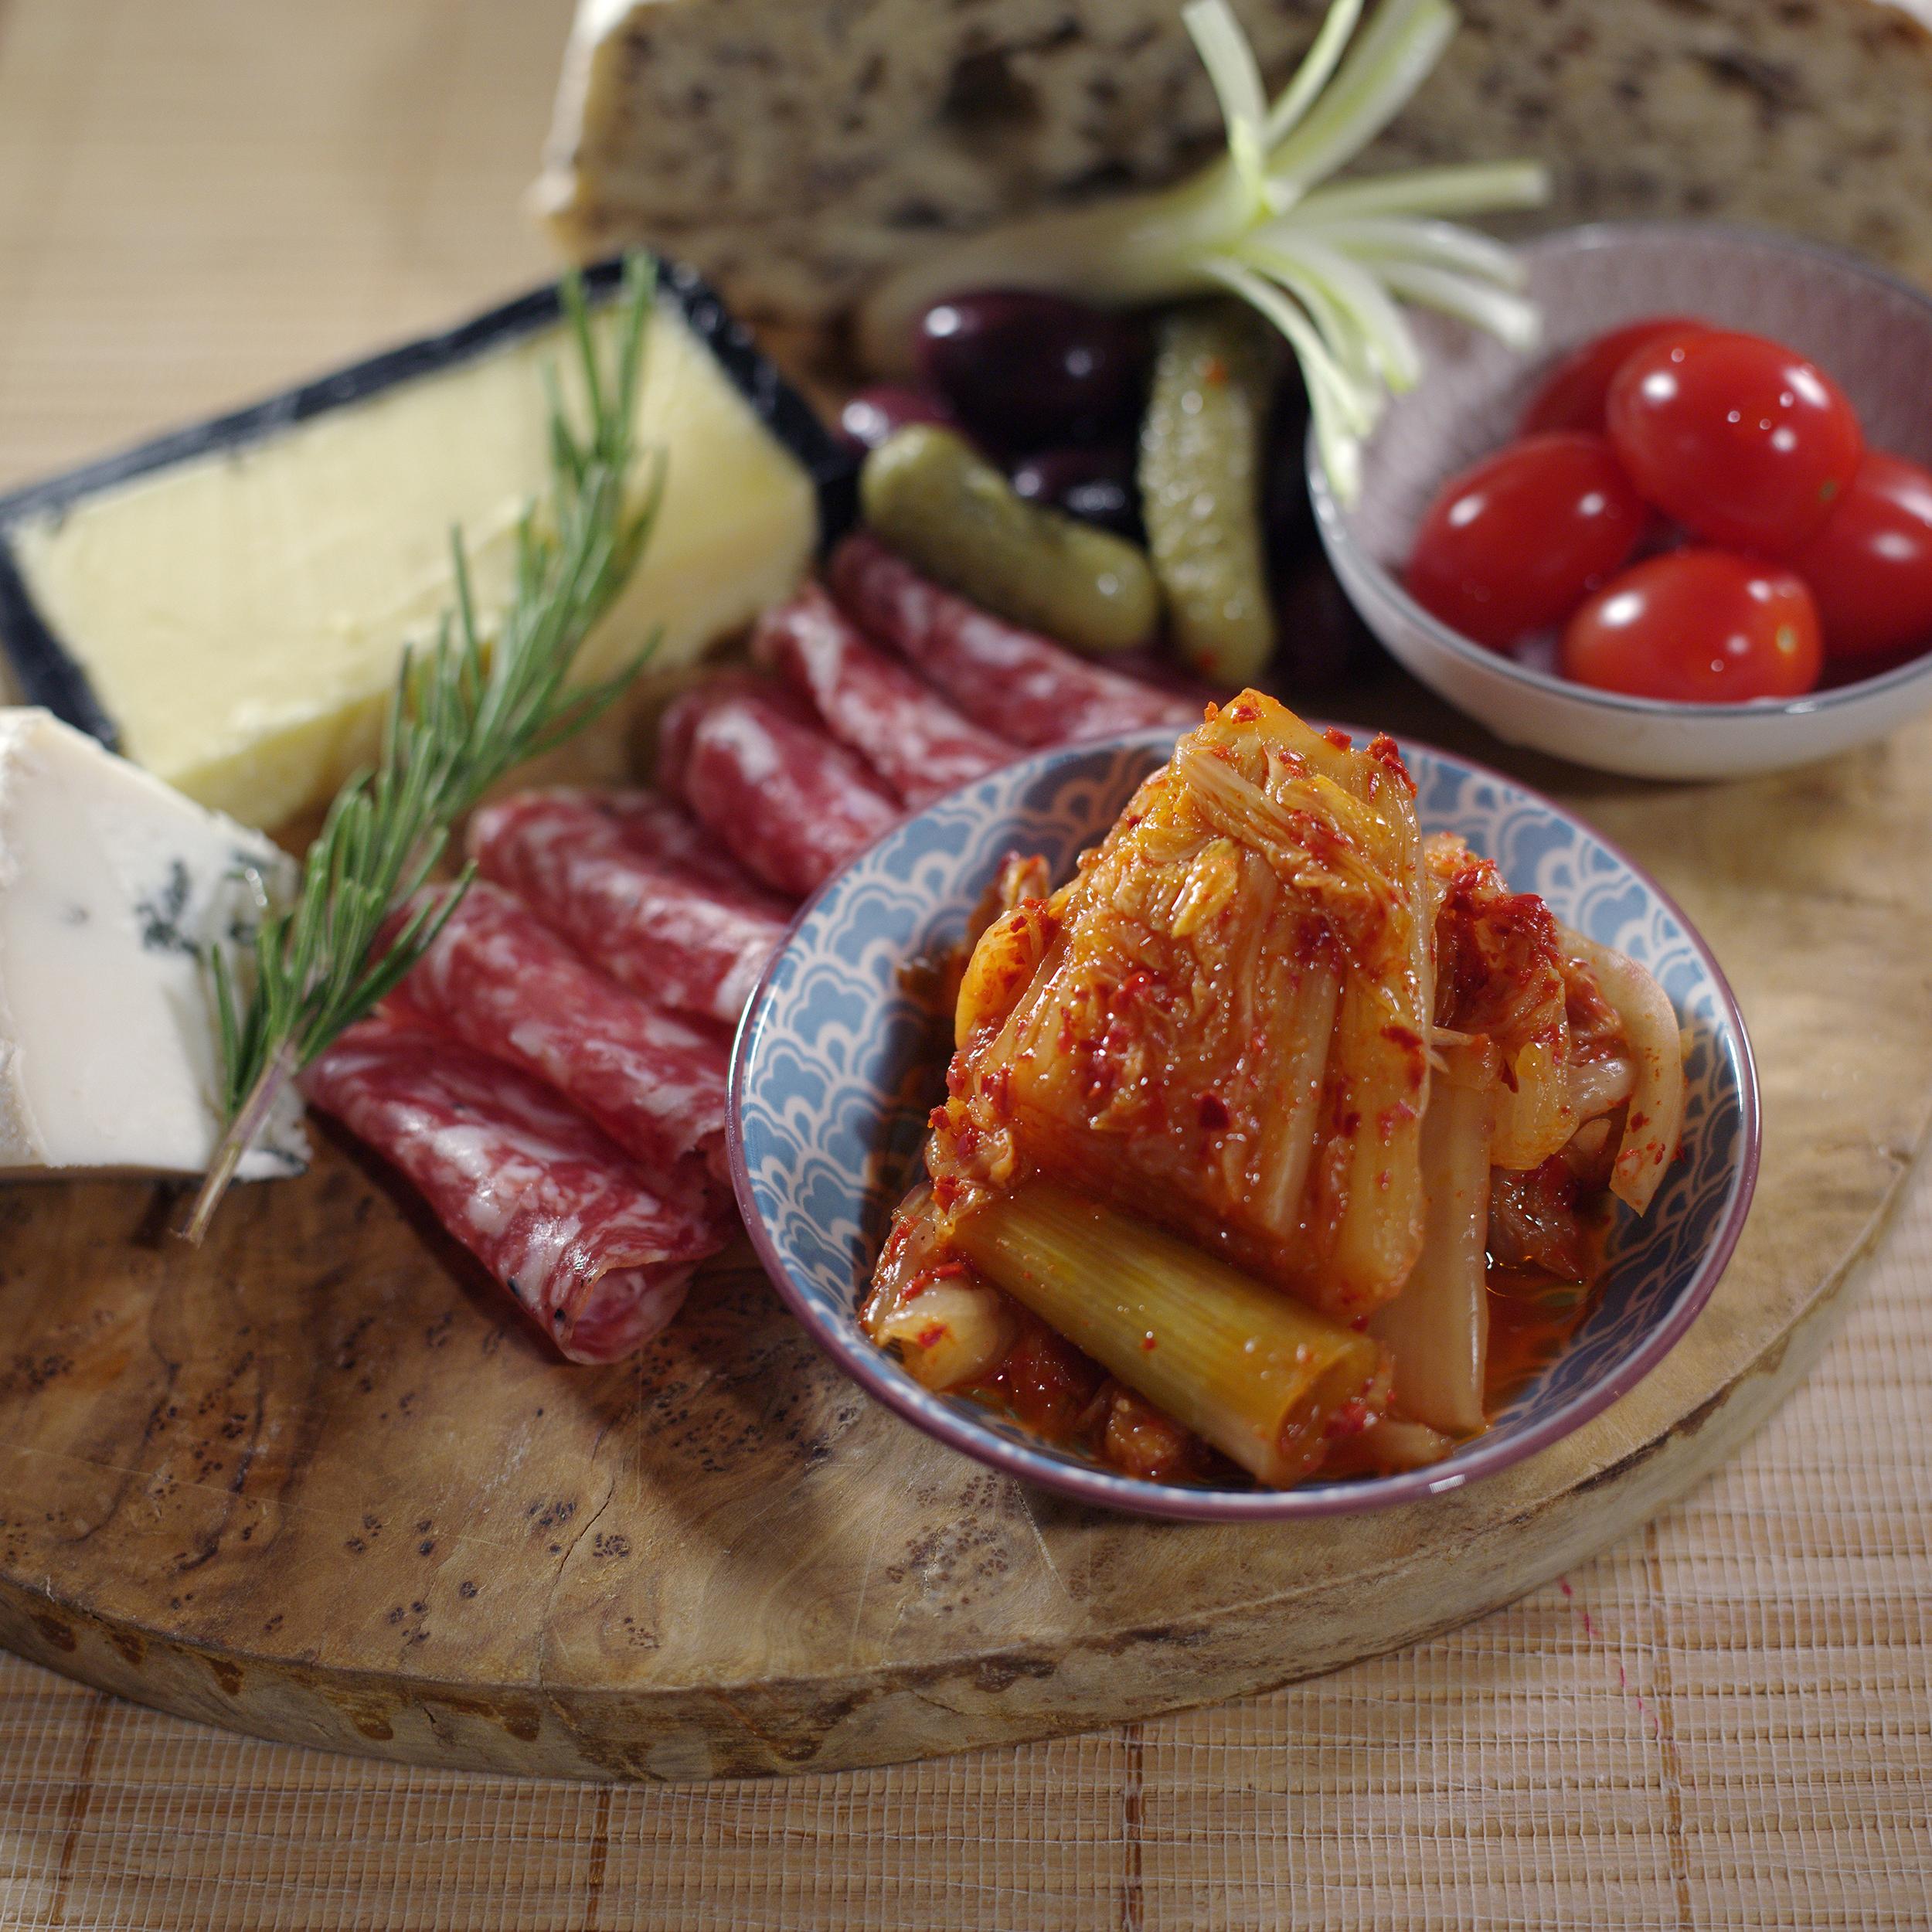 kchi-cheese-100dpi-18